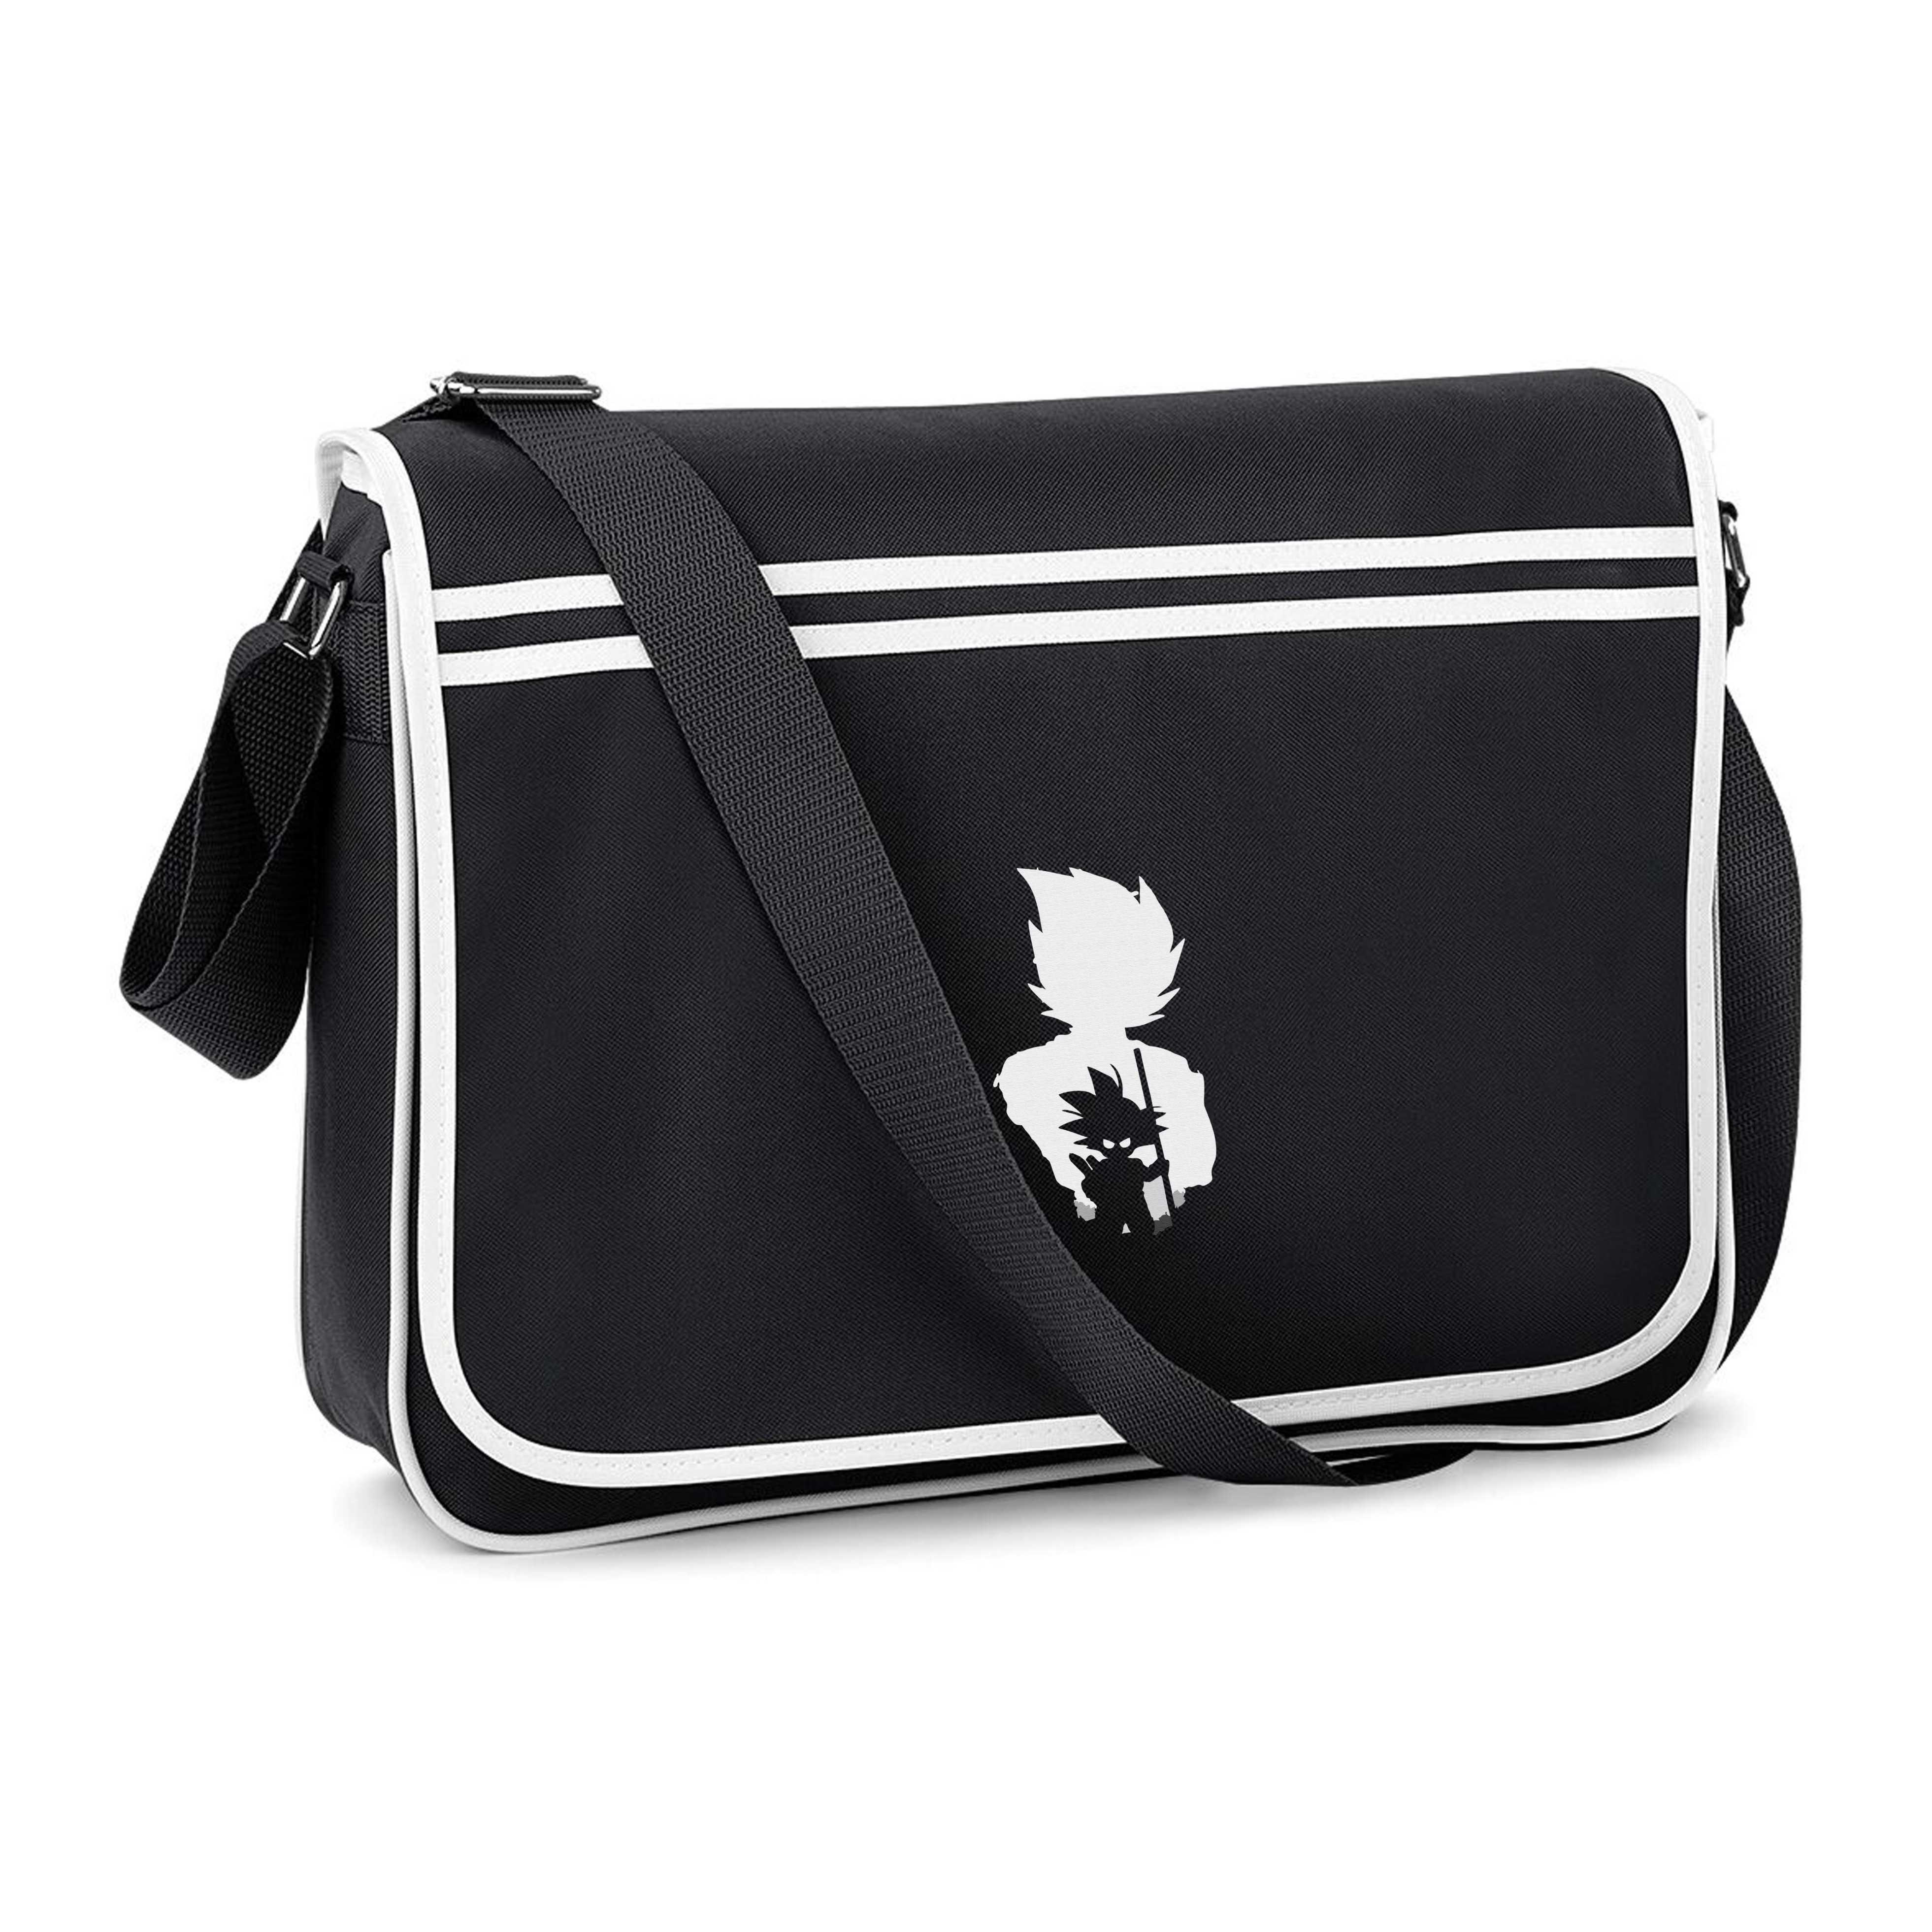 Dragon Ball Z Messenger Bag